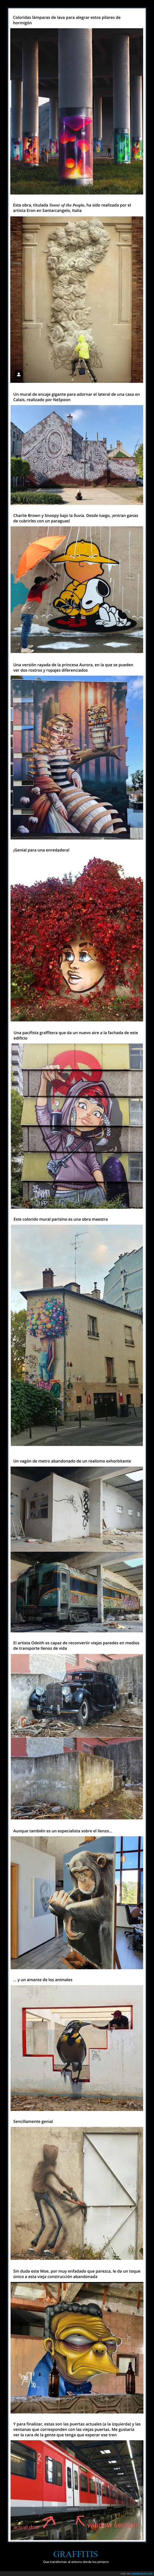 entorno,graffitis,transformar